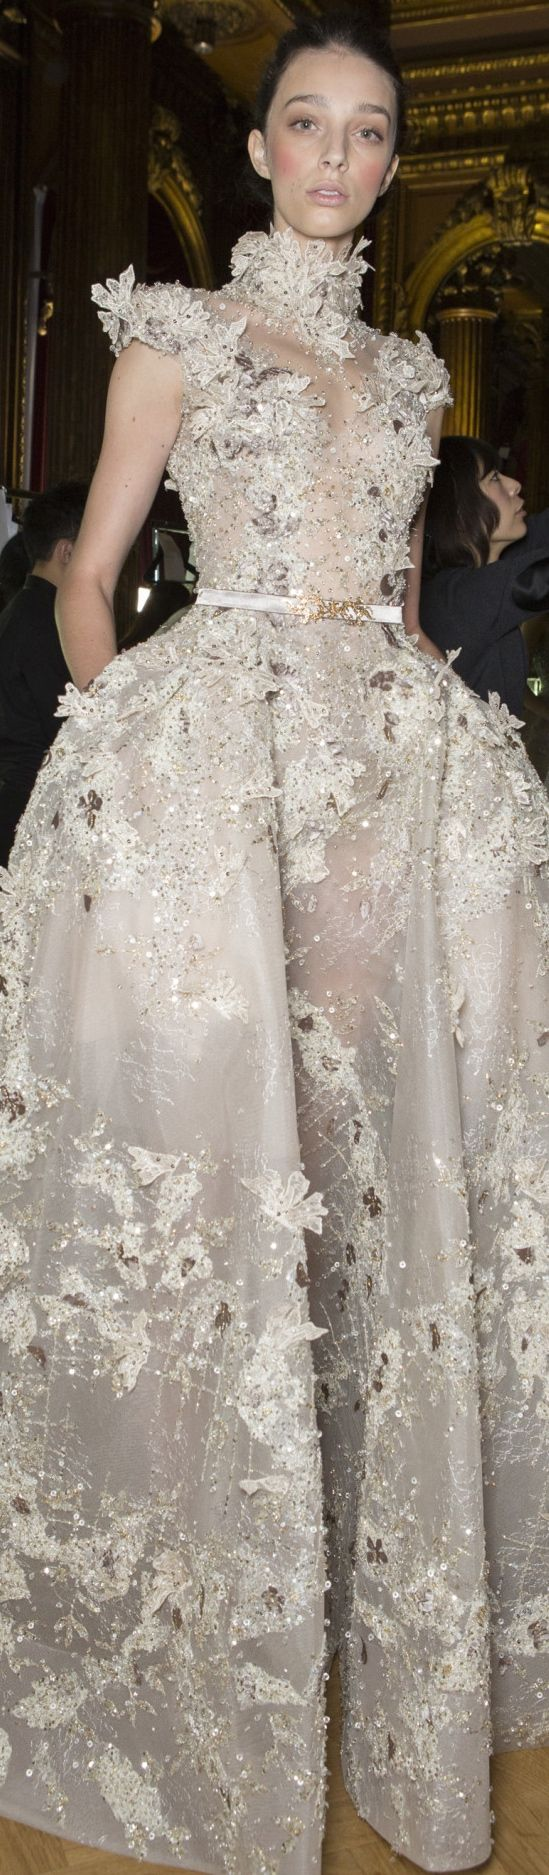 Lace up back wedding dress november 2018  best VANILLA CREAM COLORS images on Pinterest